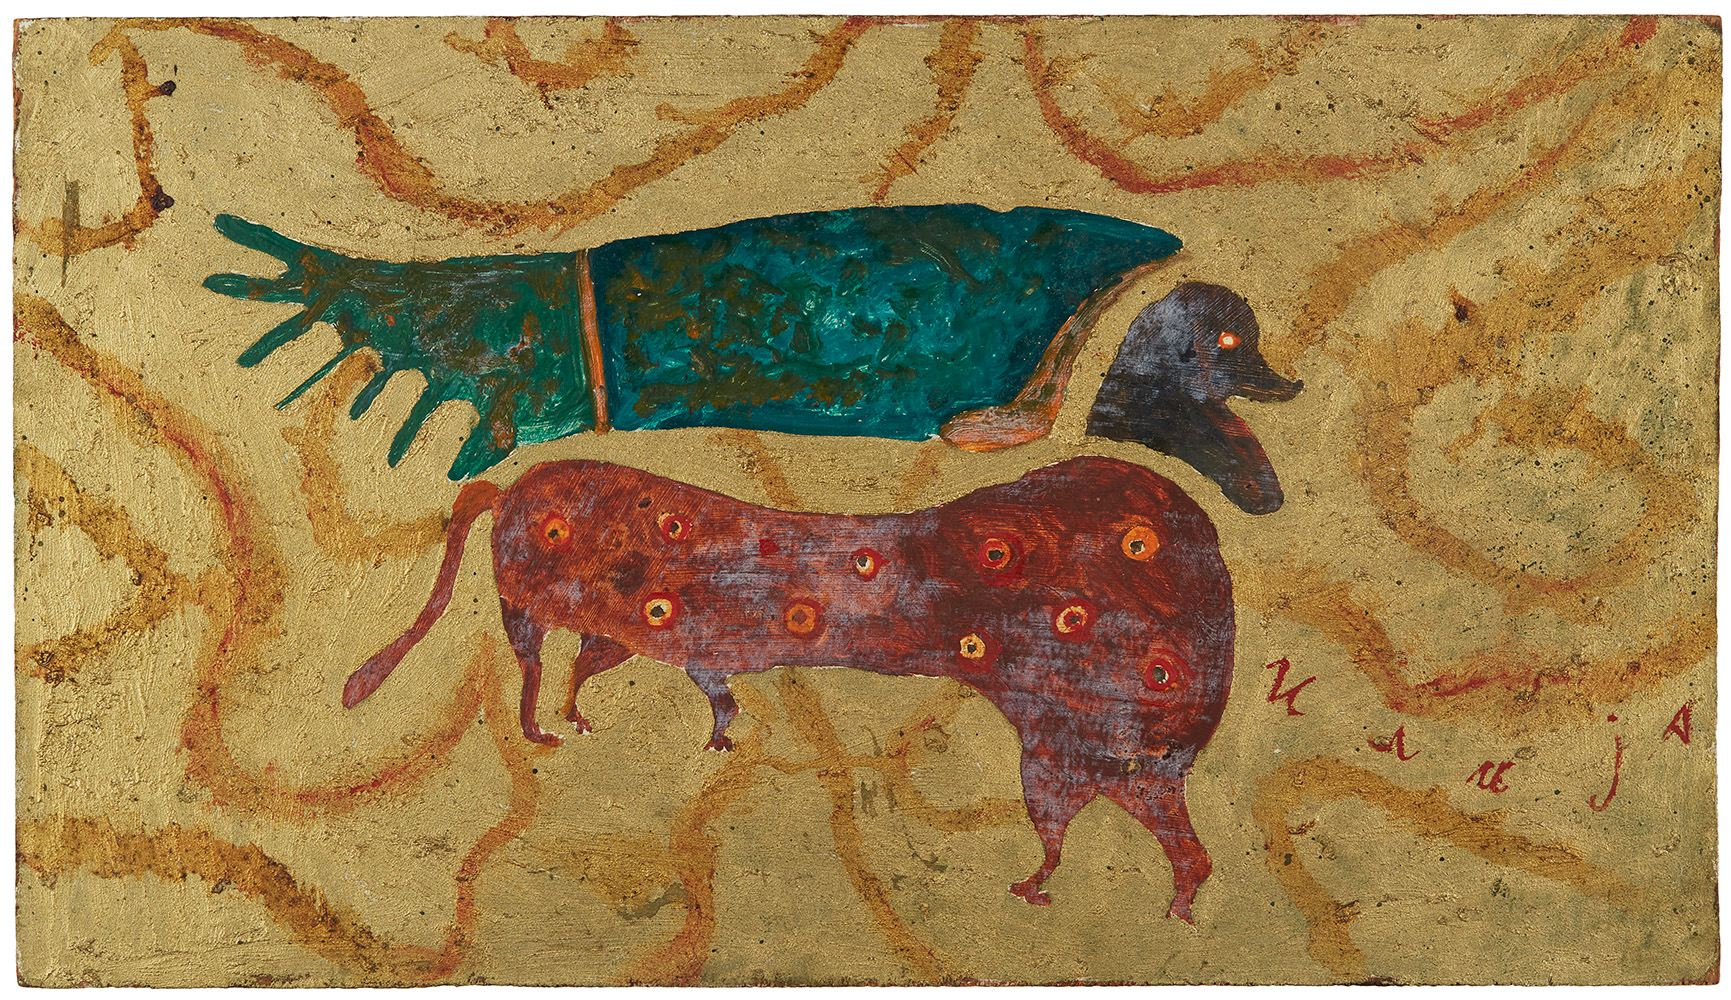 Ilija Bosilj Bašičević    From the Apocalypse: Animal with Human Head  , 1965 Oil on board 9.5 x 16.75 inches 24.1 x 42.5 cm IBo 8